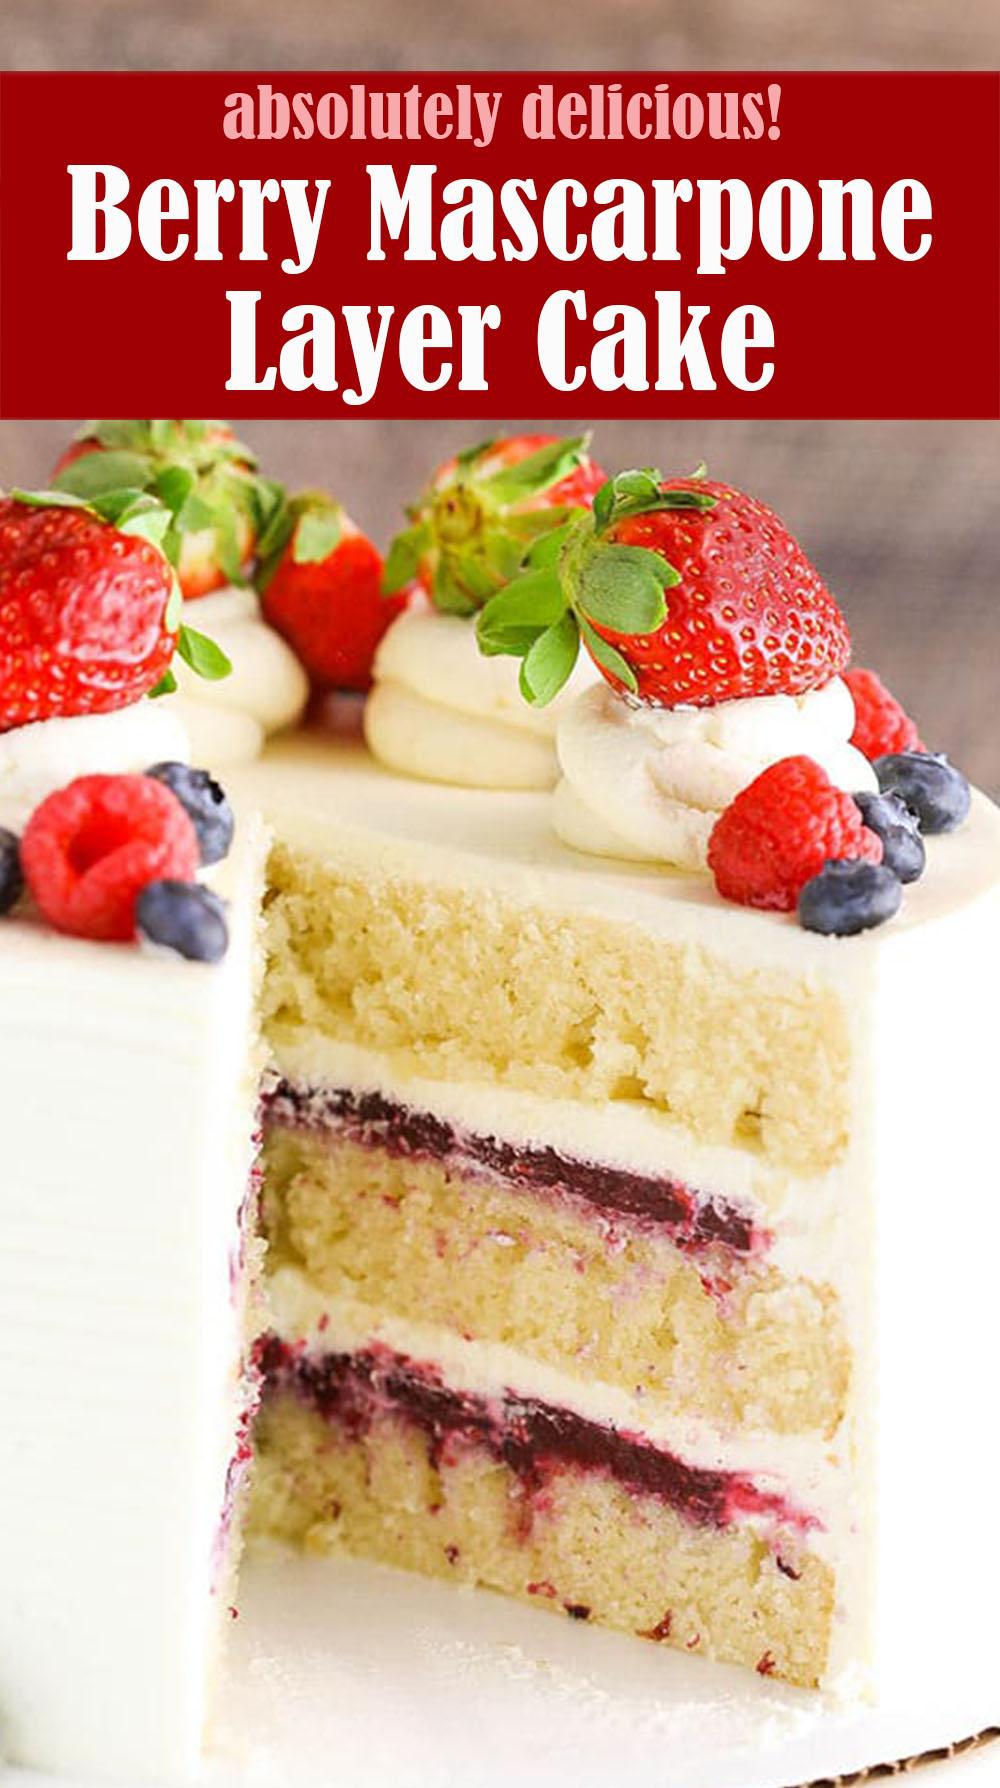 Delicious Berry Mascarpone Layer Cake